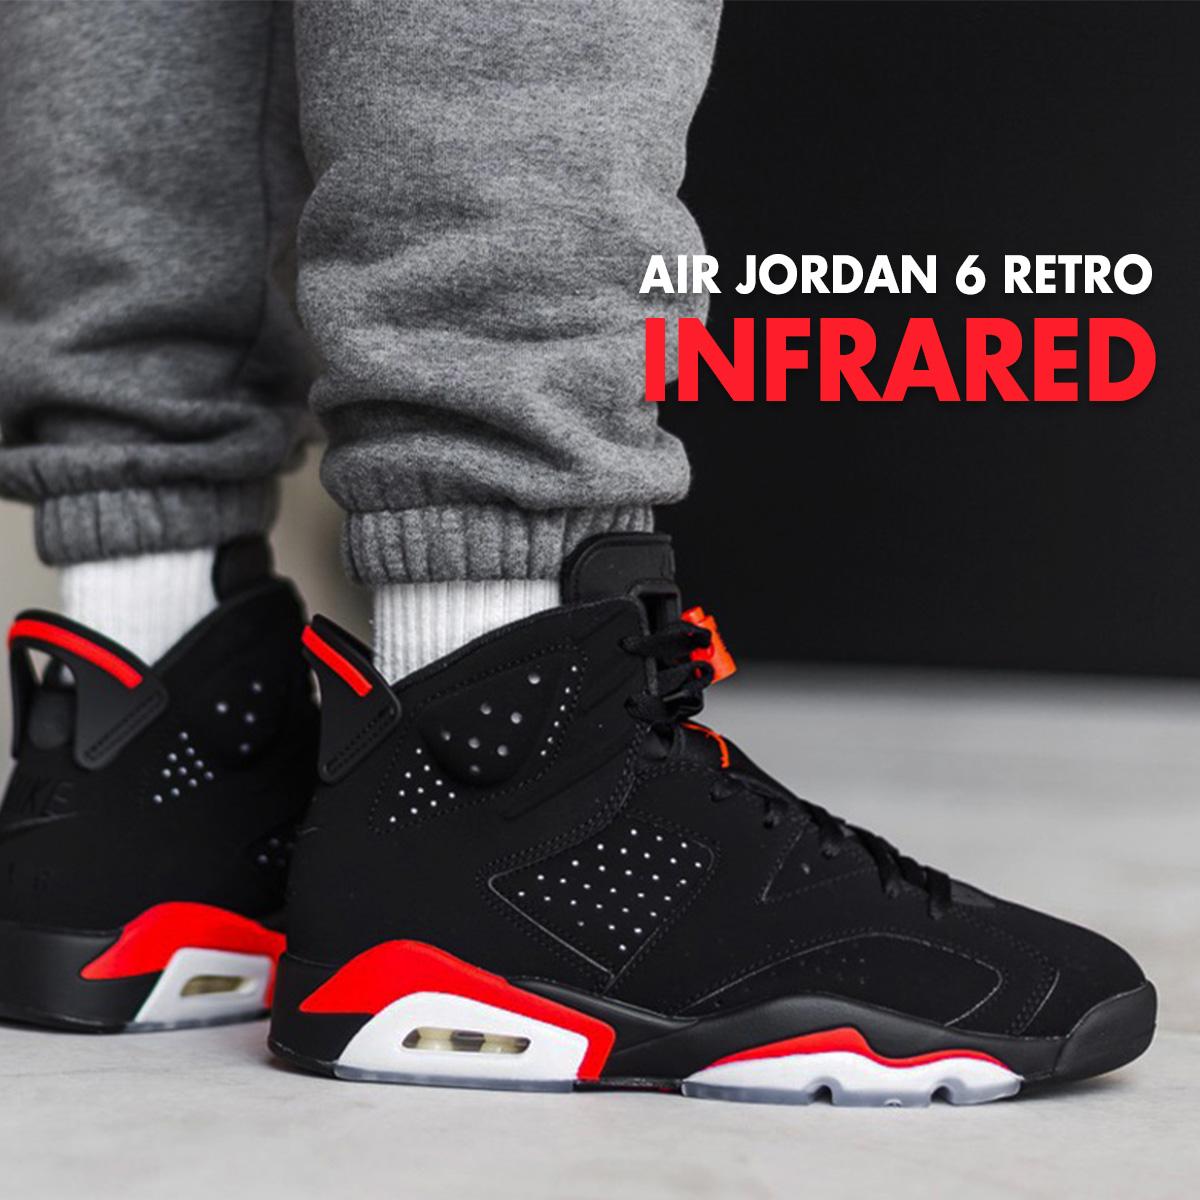 new styles 0b0f4 d71d4 NIKE Nike Air Jordan 6 nostalgic sneakers men AIR JORDAN 6 RETRO black  black infrastructure red 384,664-060